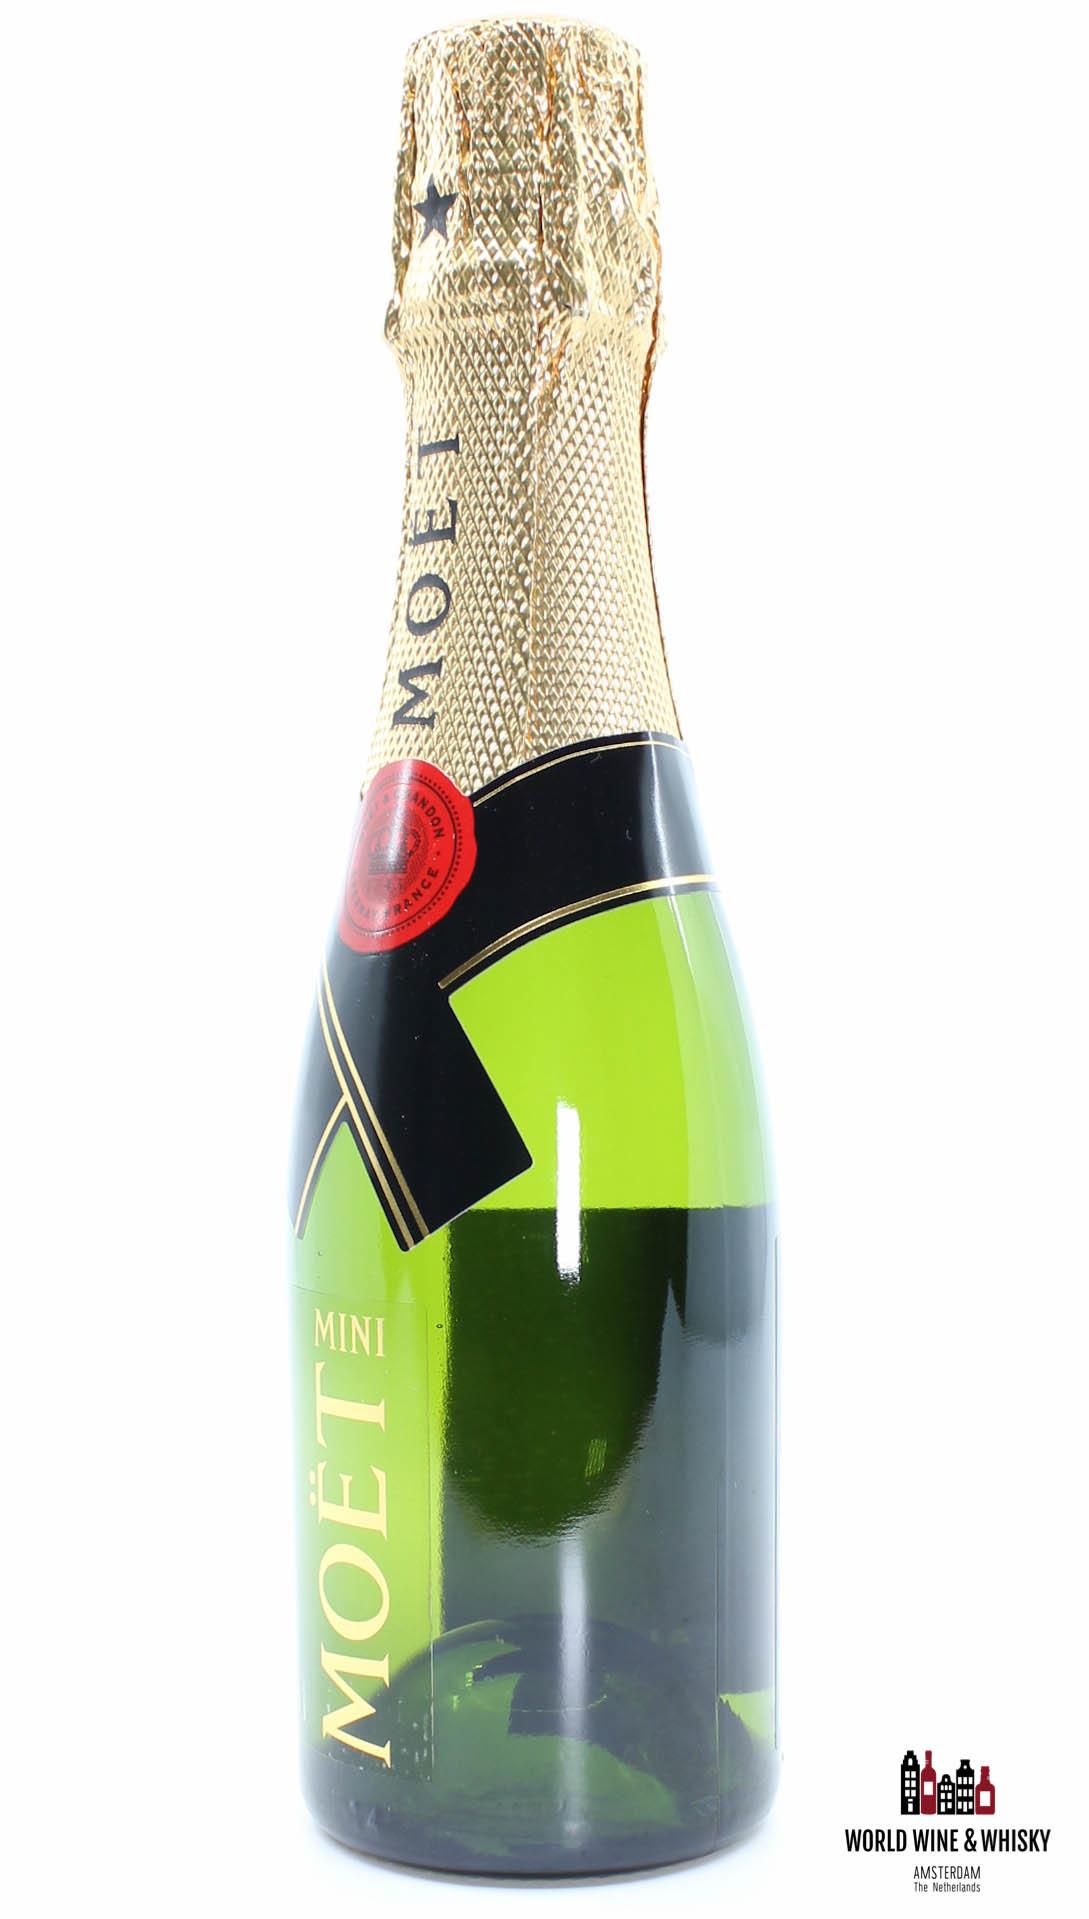 Moët Chandon Moët Chandon Imperial Champagne Brut - Mini Edition 200ml